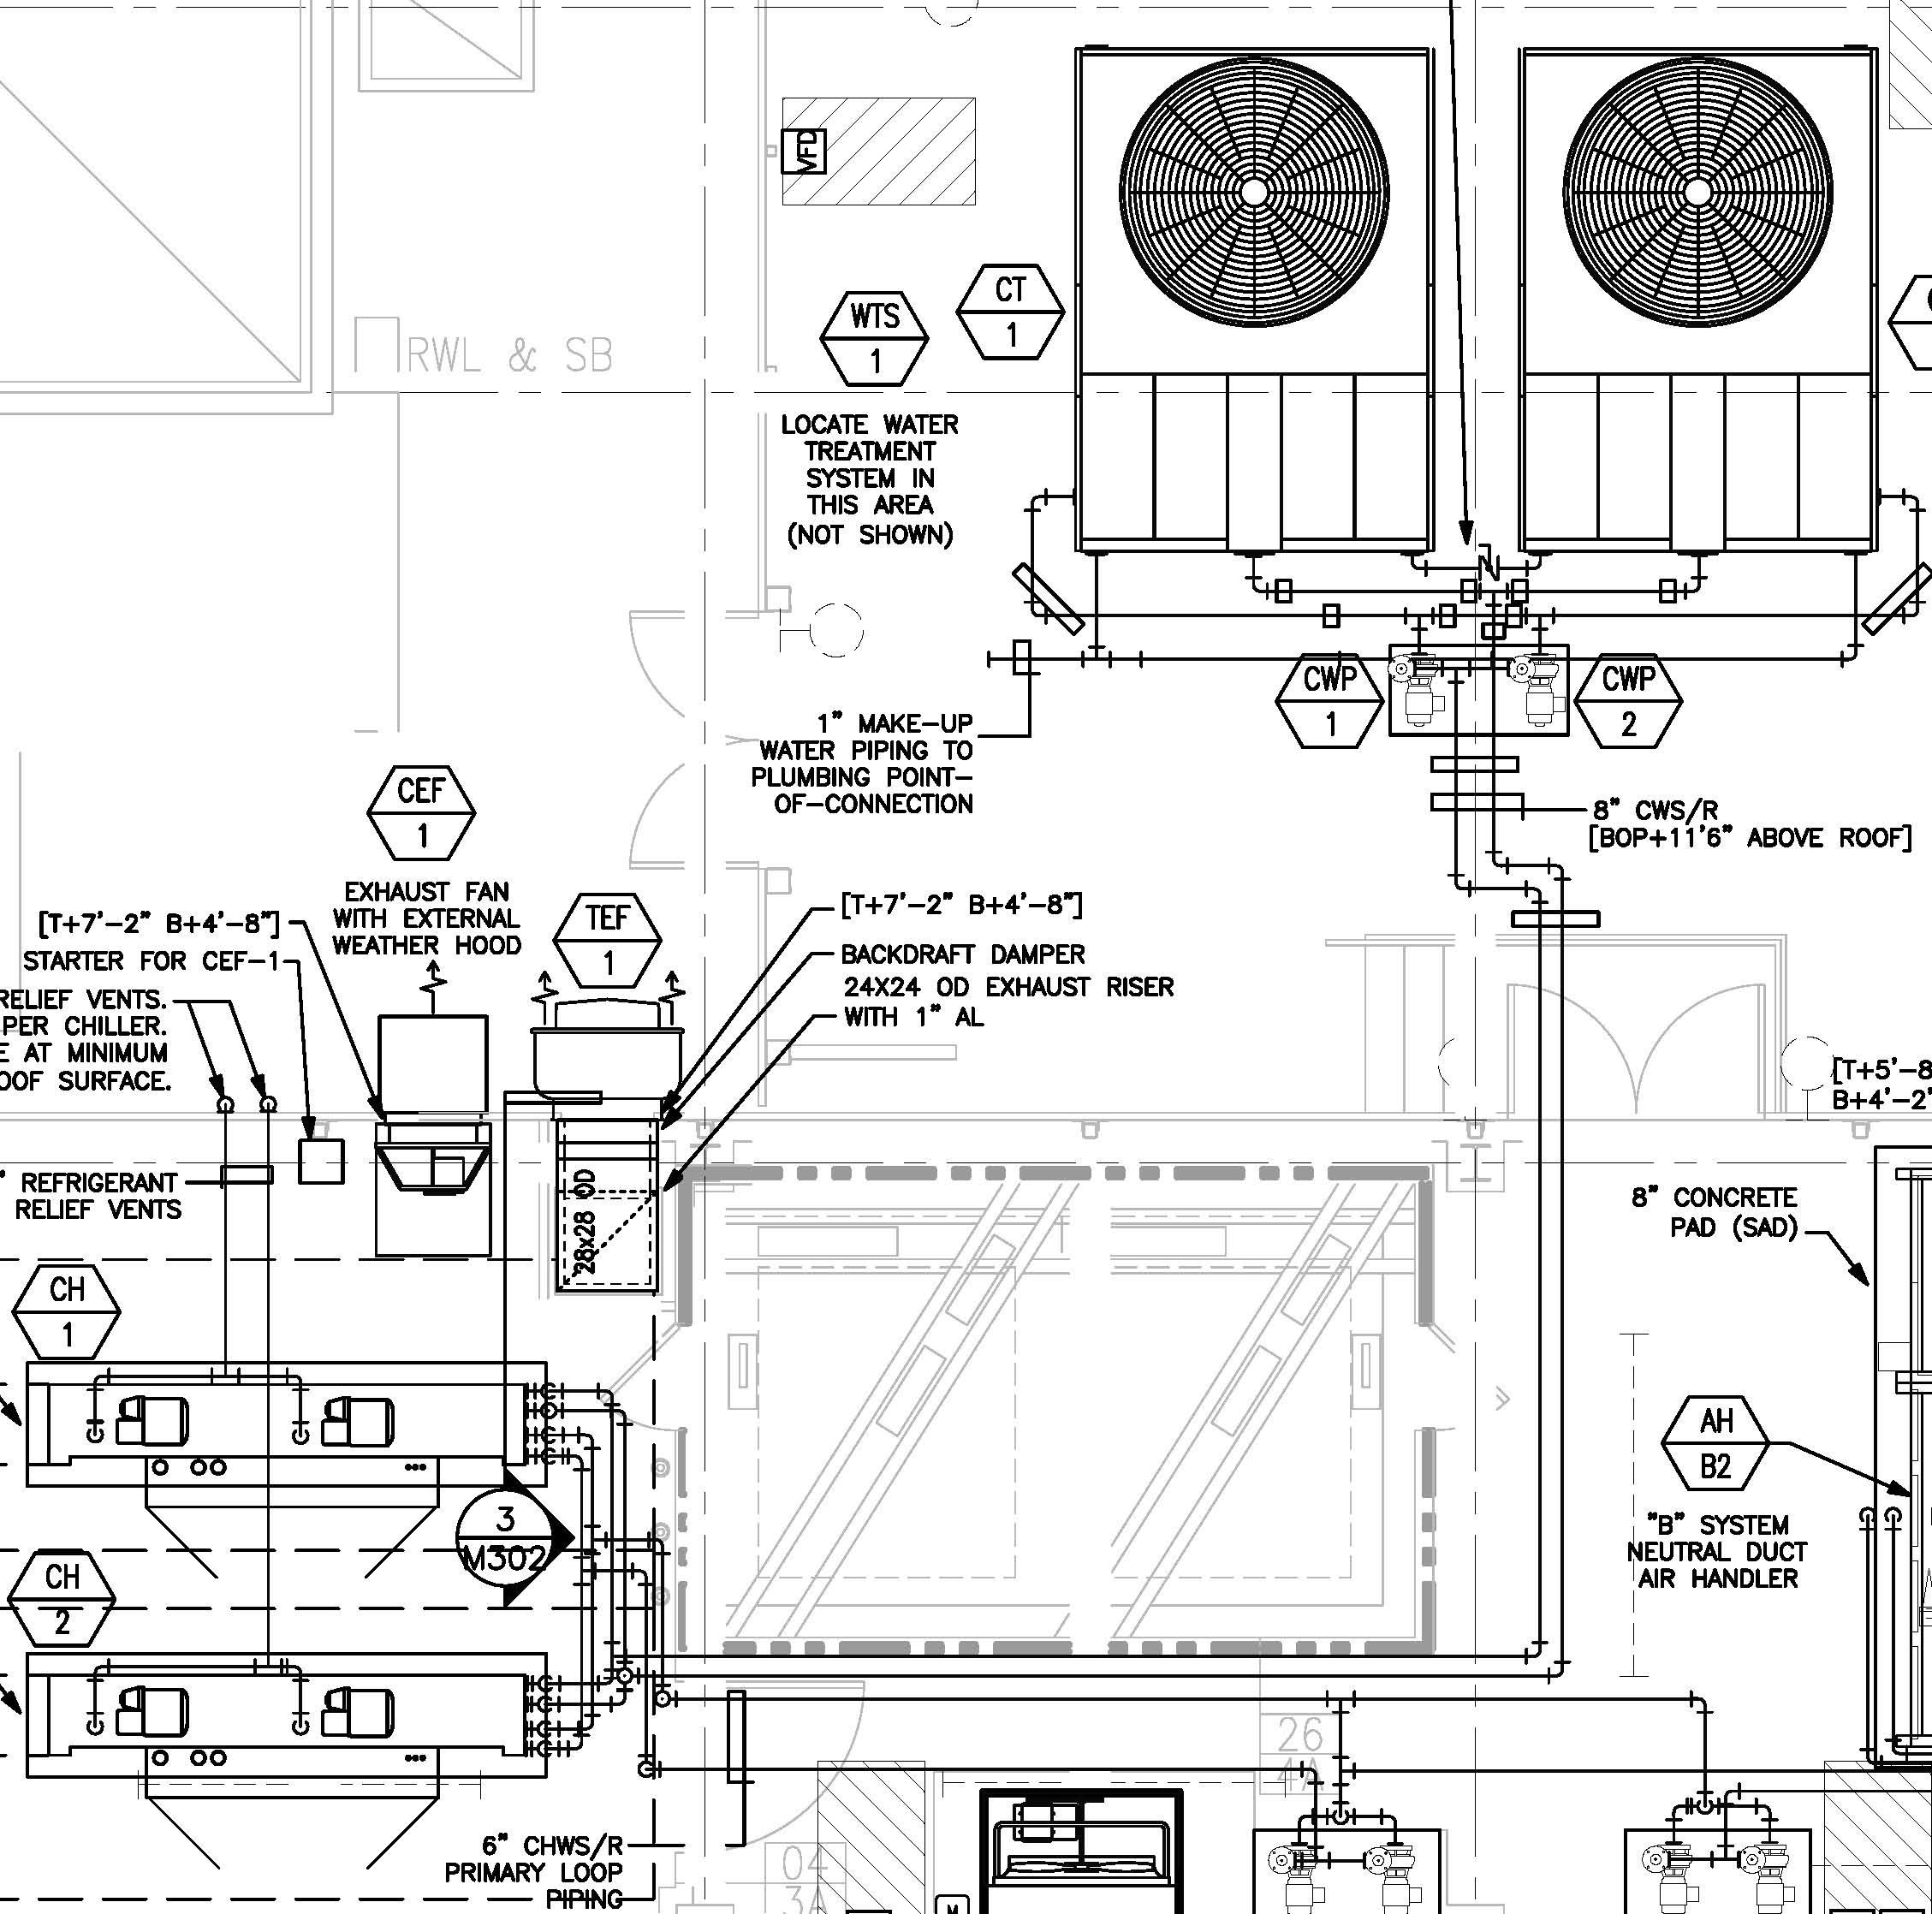 Weathertron thermostat Wiring Diagram Payne thermostat Wiring Diagram Electrical Wiring Diagrams Of Weathertron thermostat Wiring Diagram